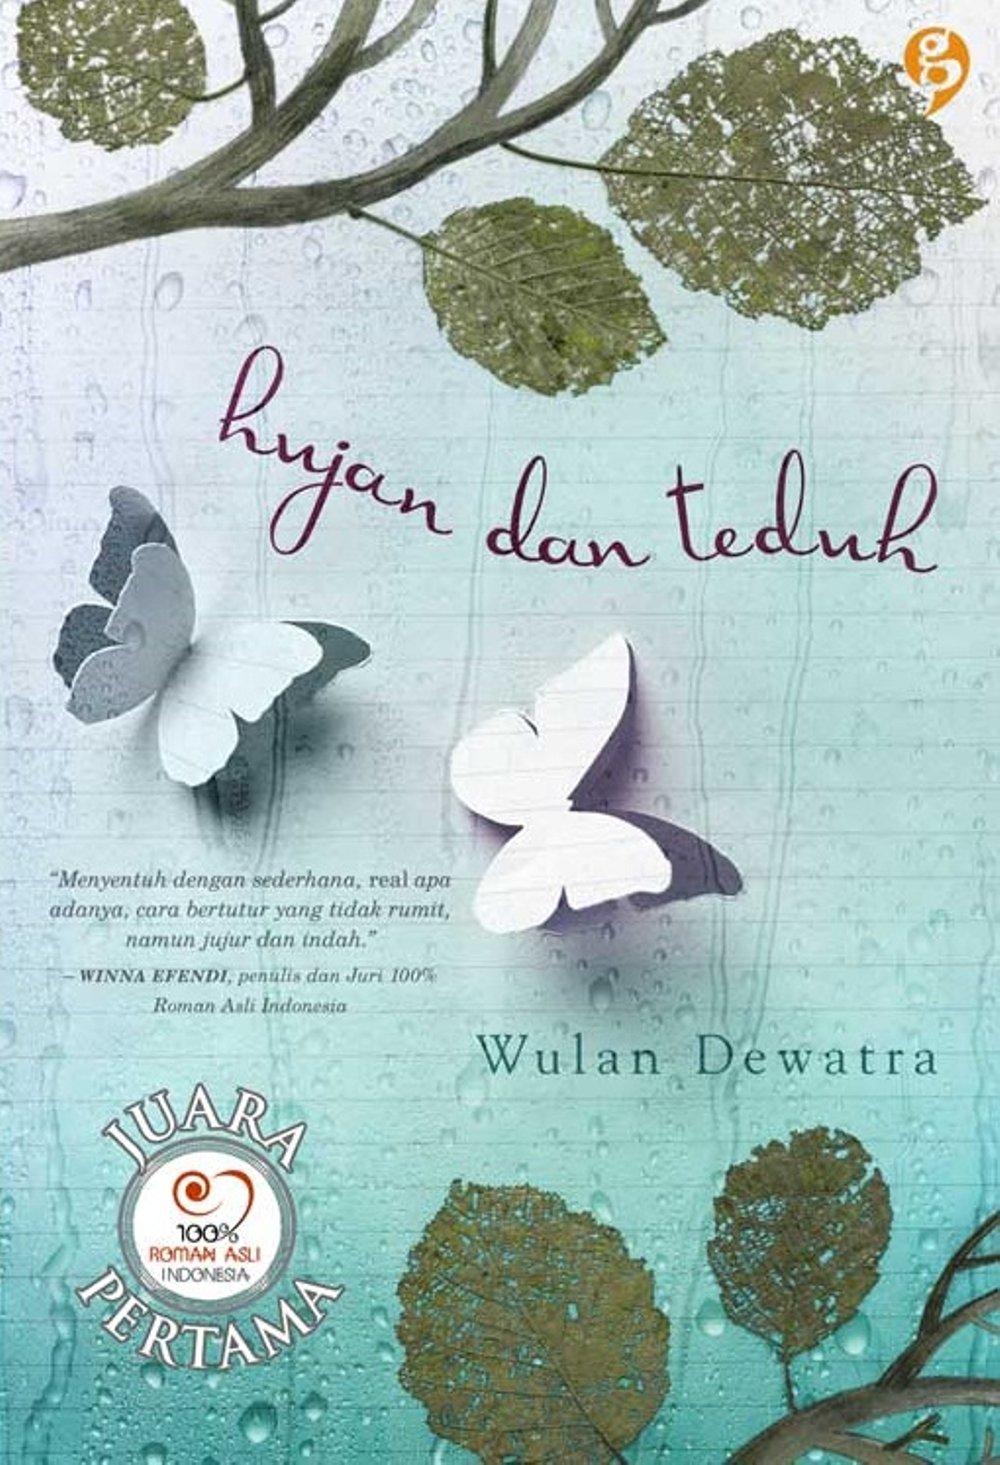 Wulan Dewatra - Hujan dan Teduh